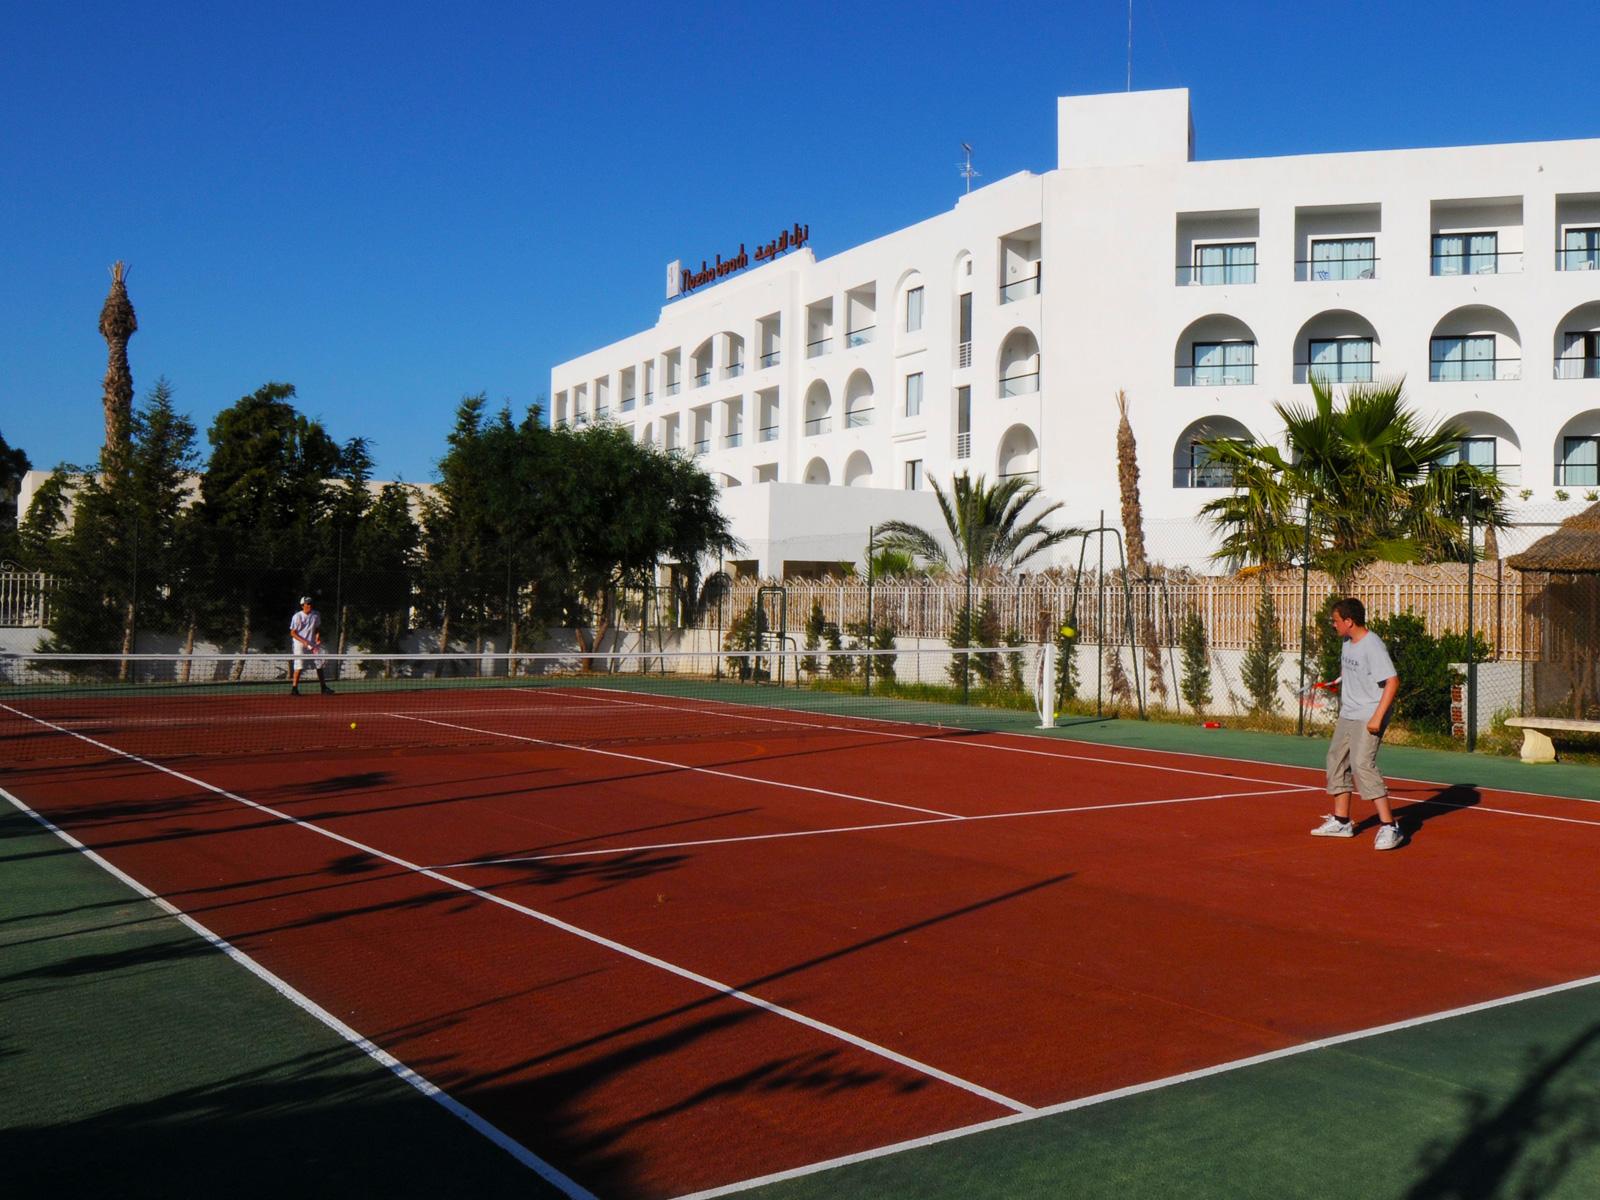 Pista Tenis - Hamammet Nozha Beach Hotel